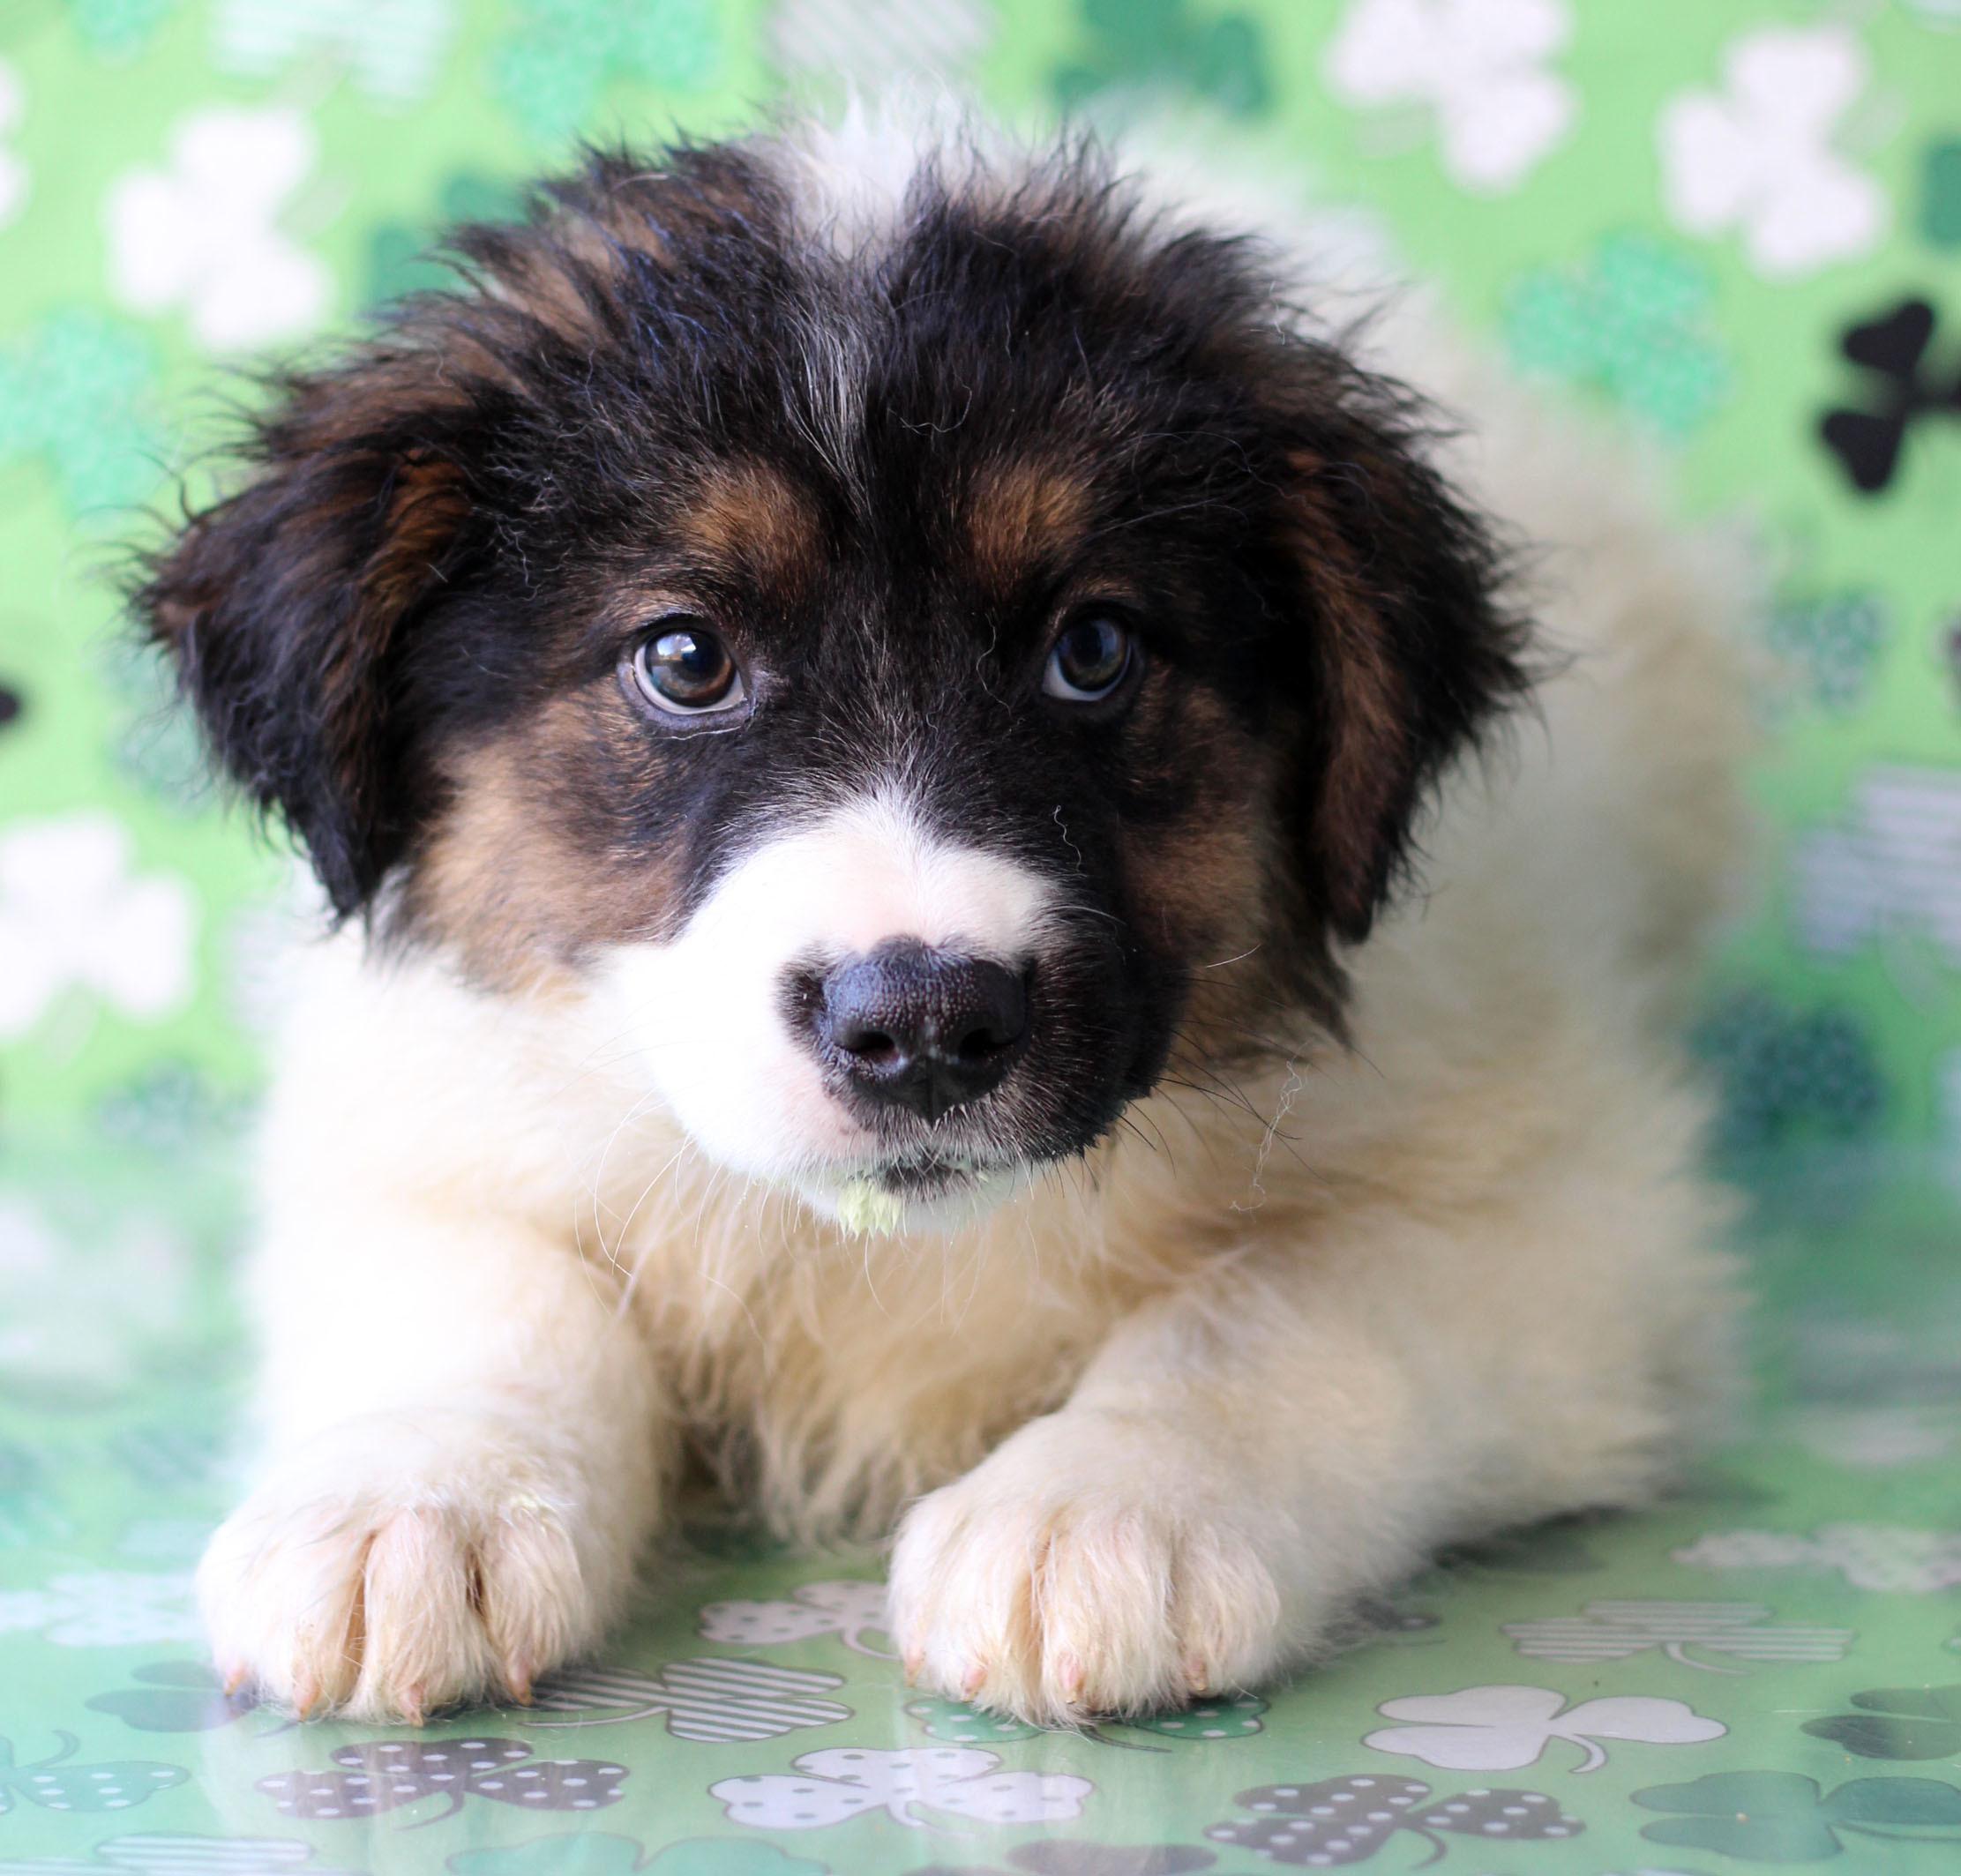 Towson Calendar.Adoption Event At The Towson Petsmart Petfinder Event Calendar